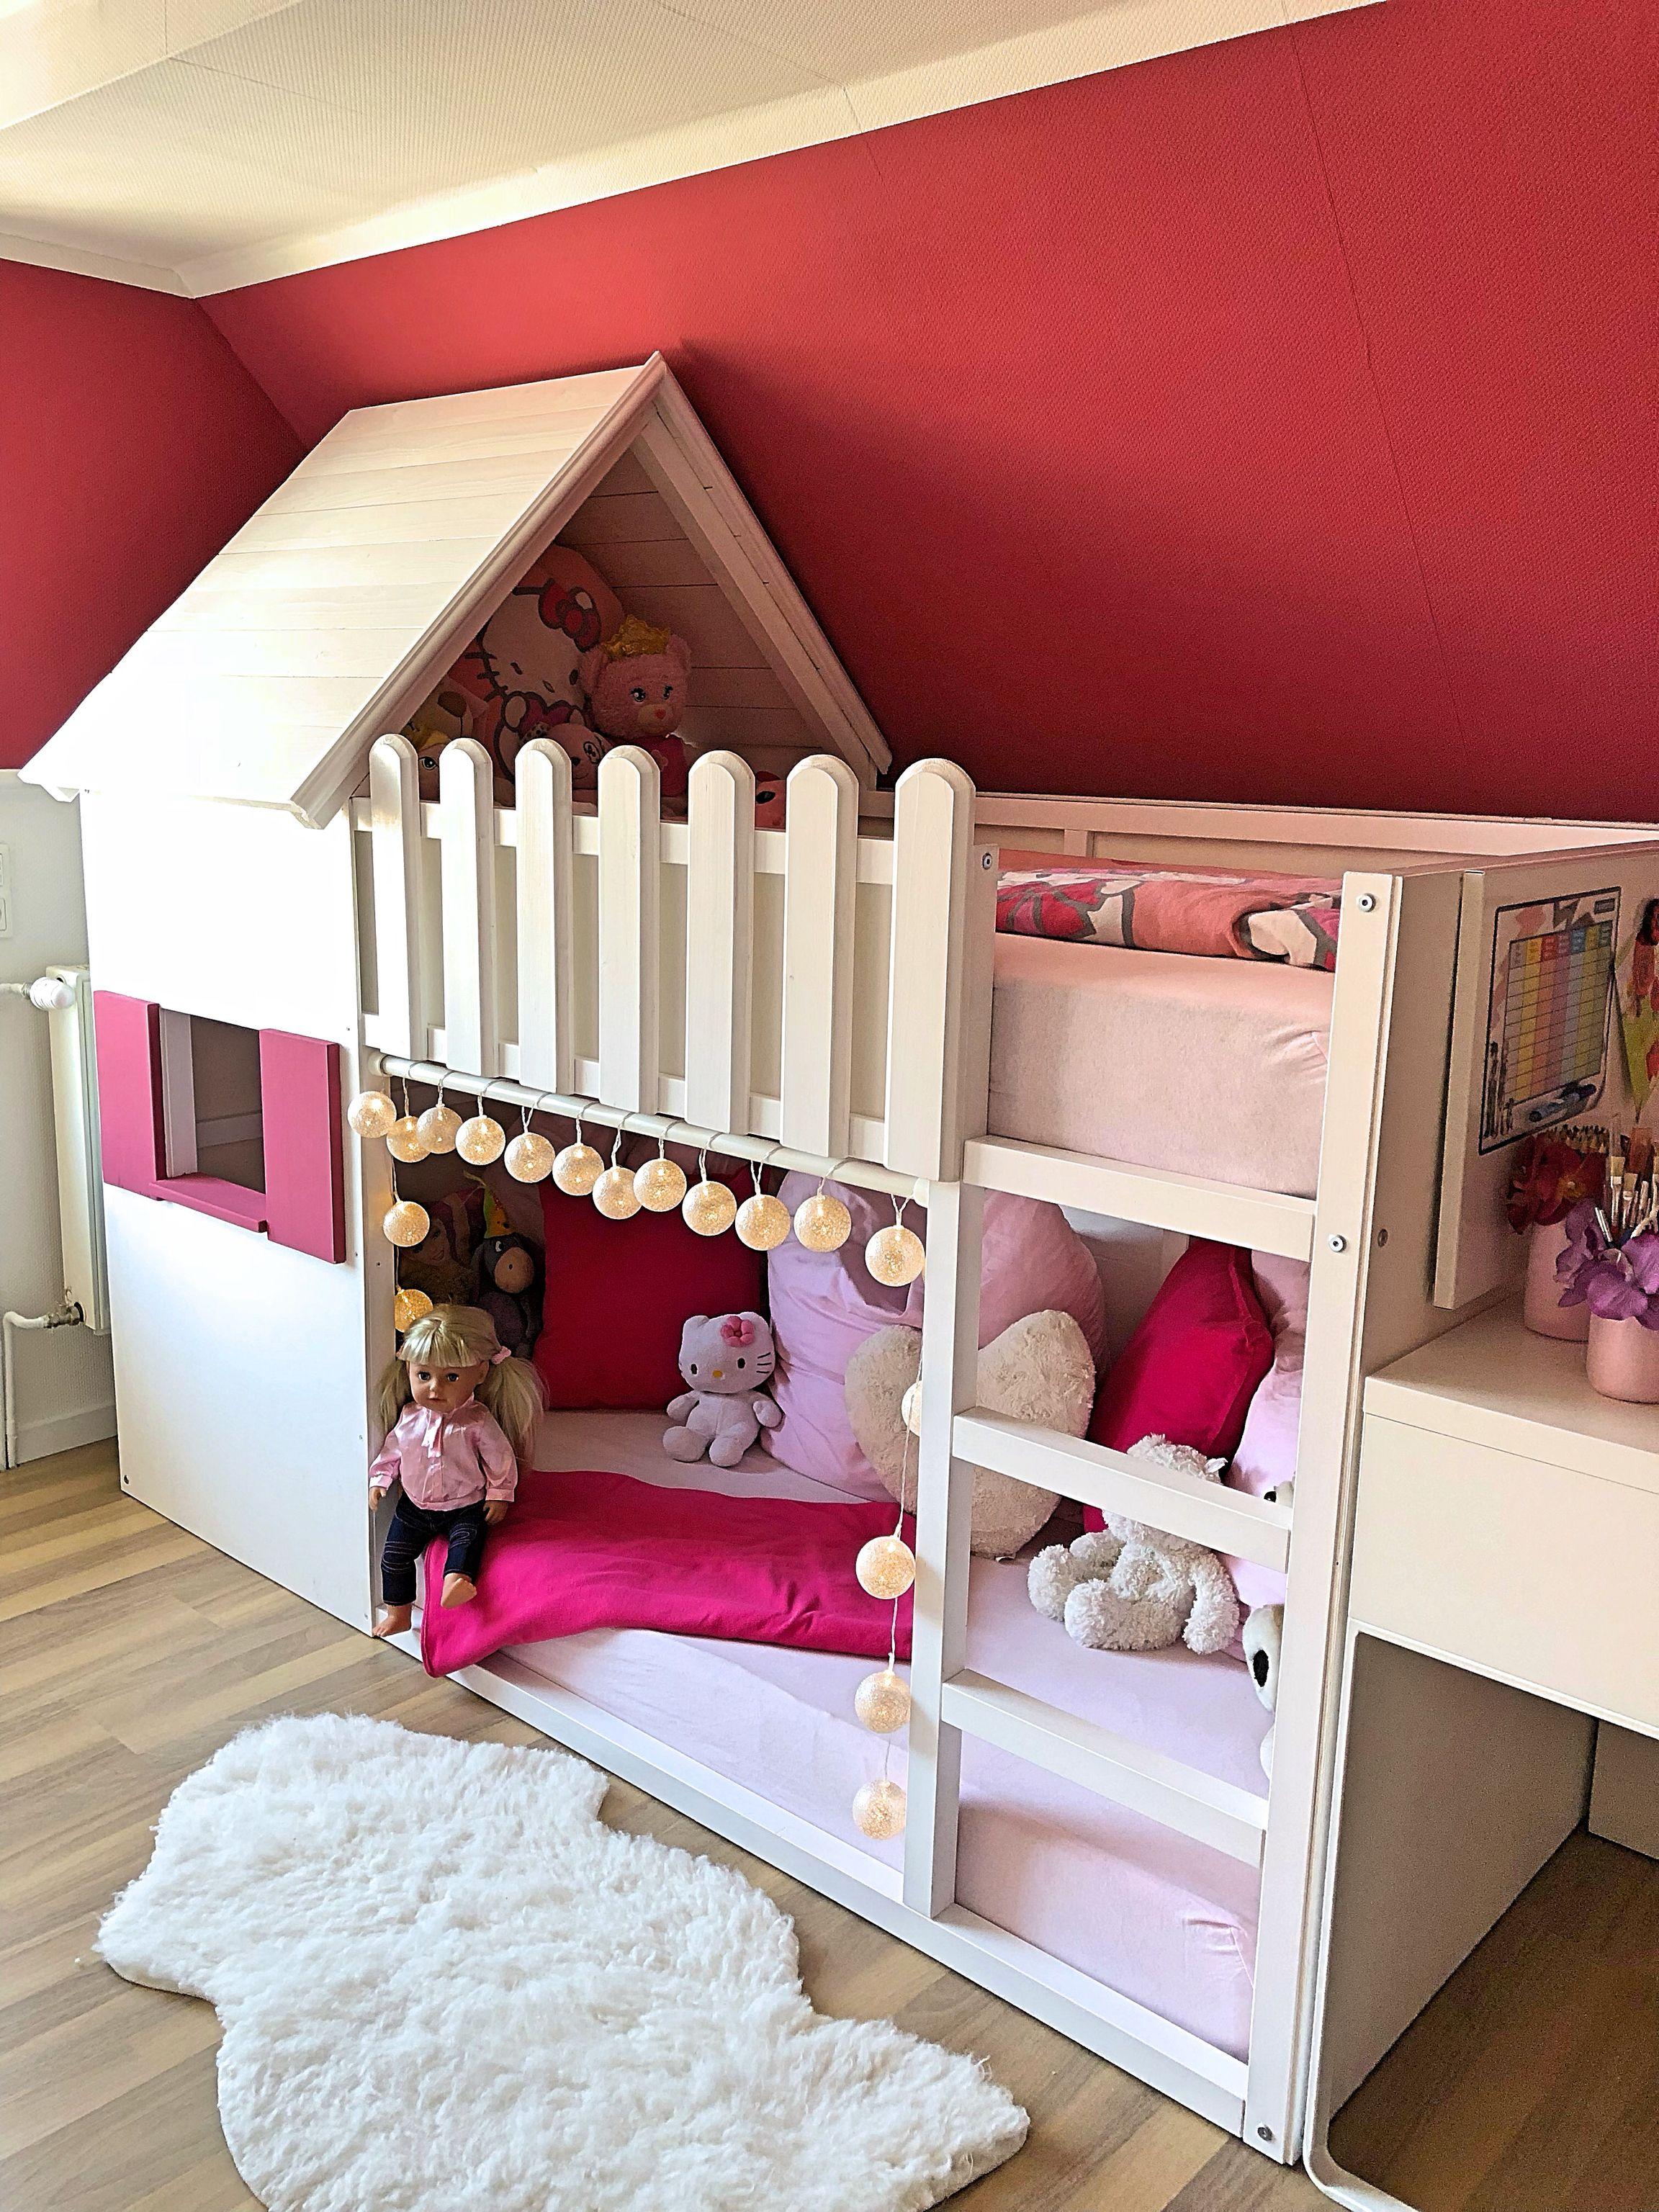 Selbstgebautes Hochbett Haus In 2020 Bett Kinderzimmer